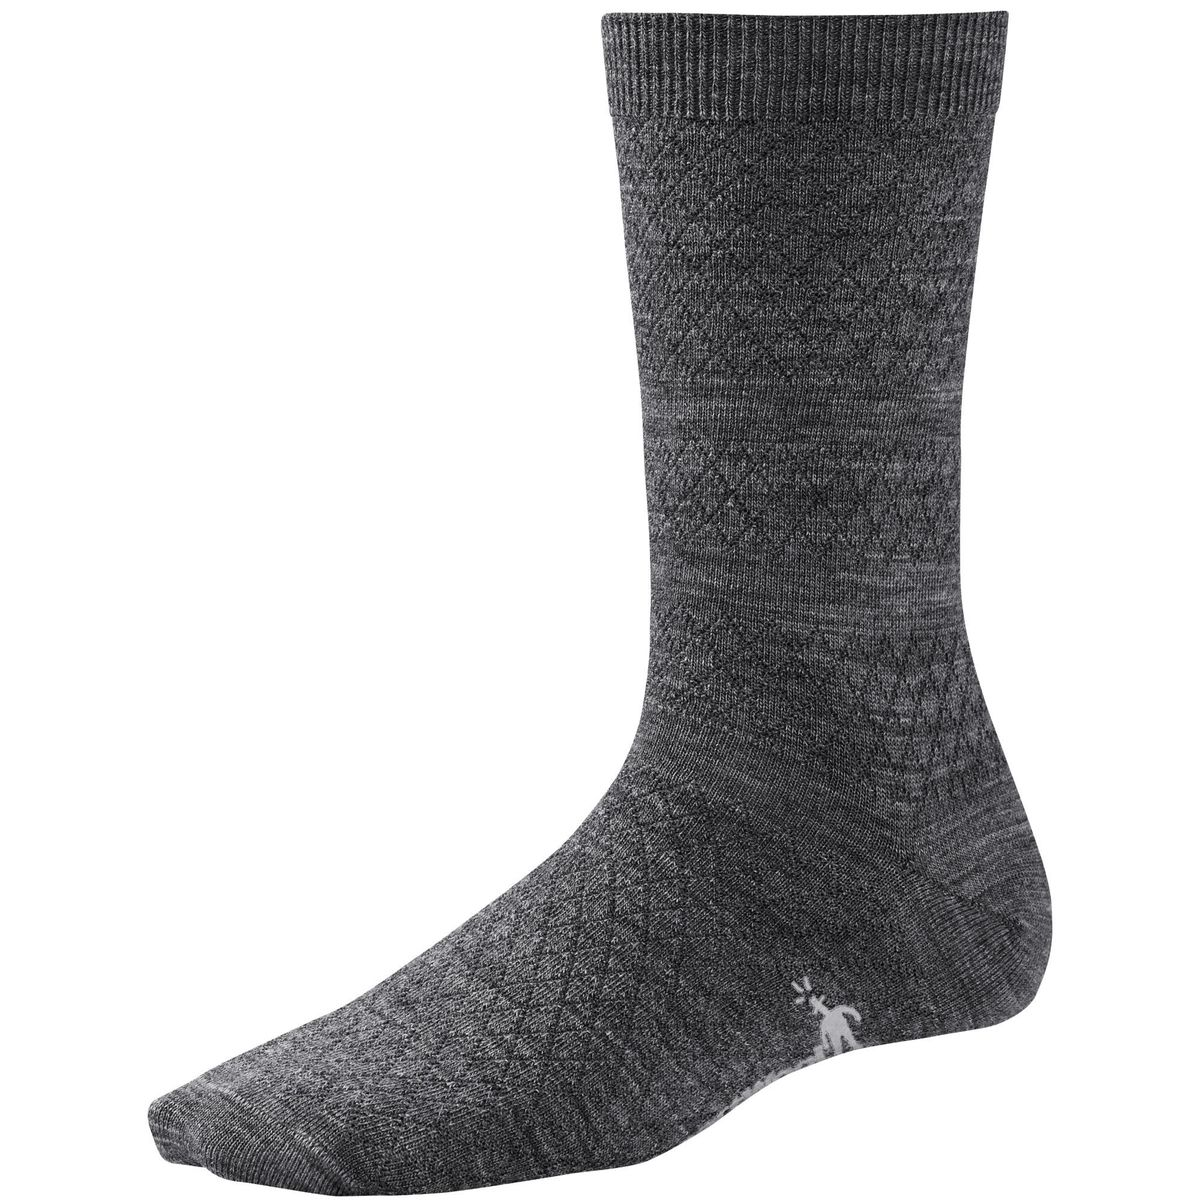 Smartwool Texture Light羊毛袜Crew Sock美国产正品现货